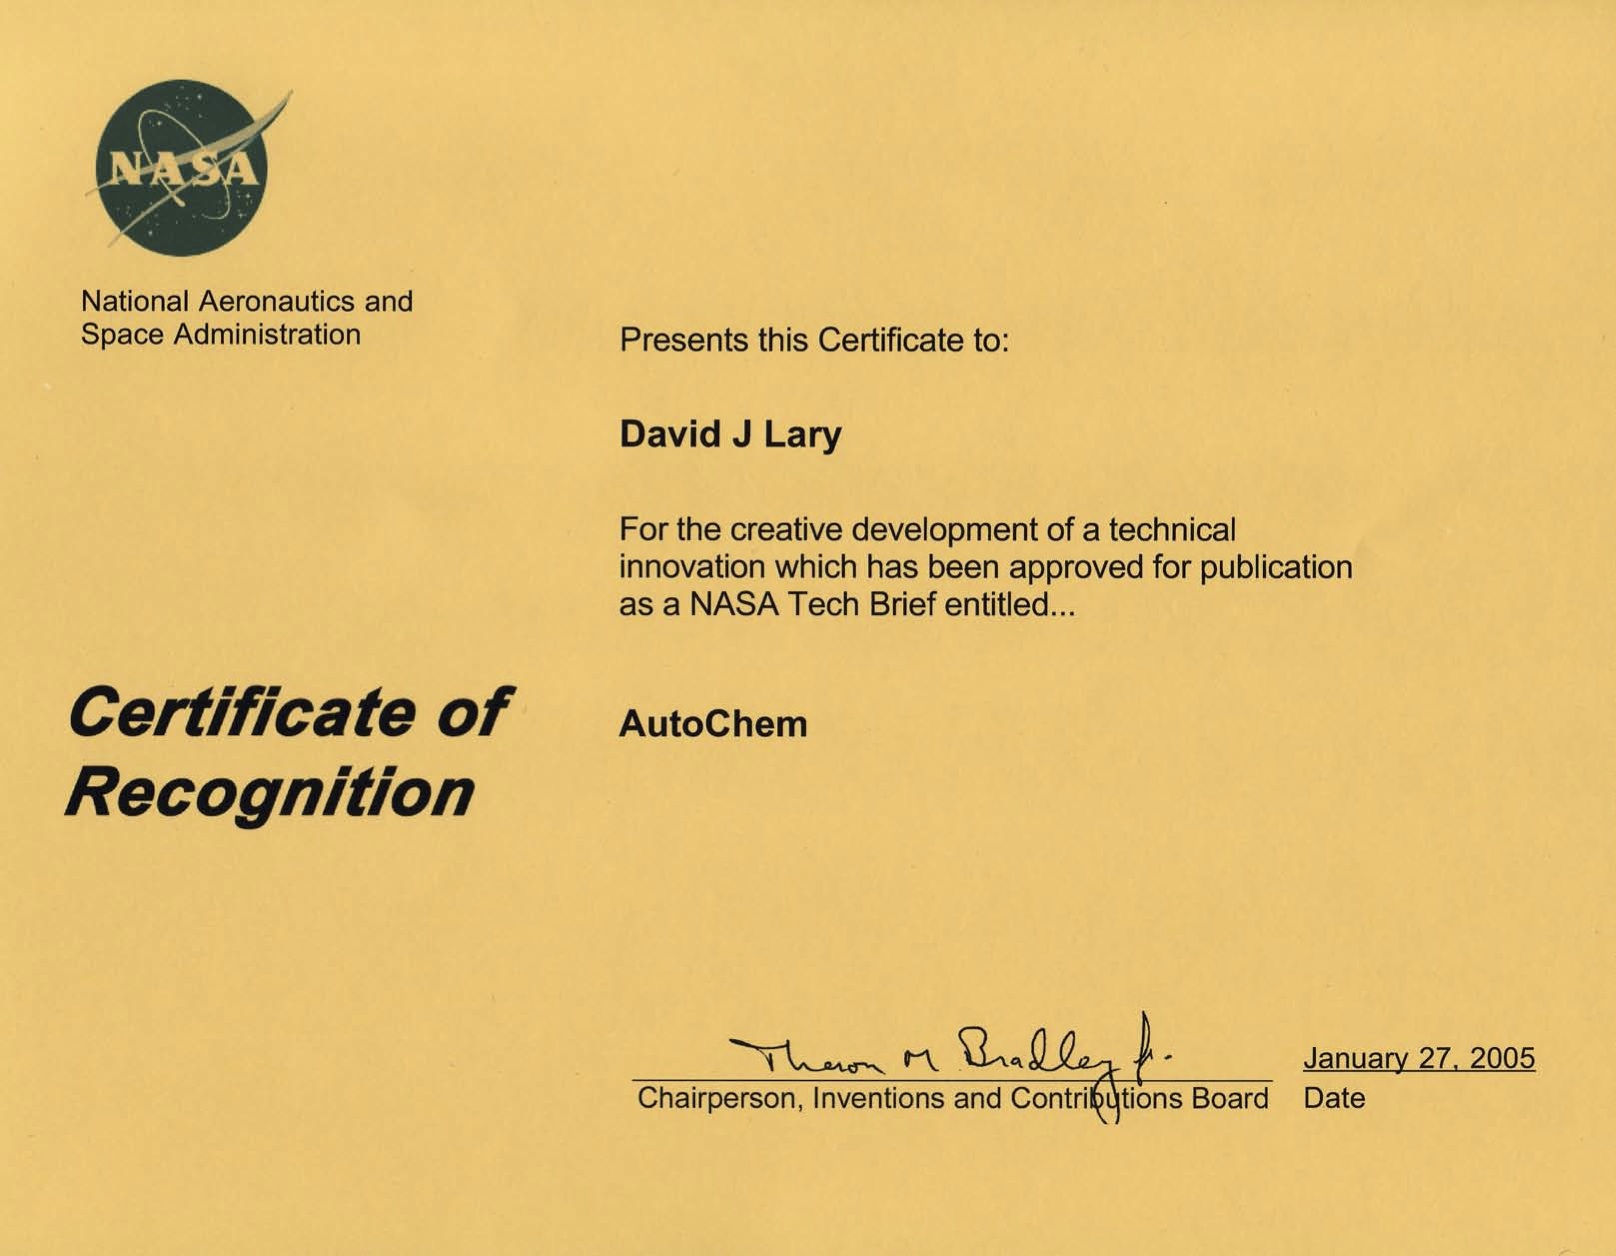 nasa employee certificate - photo #11